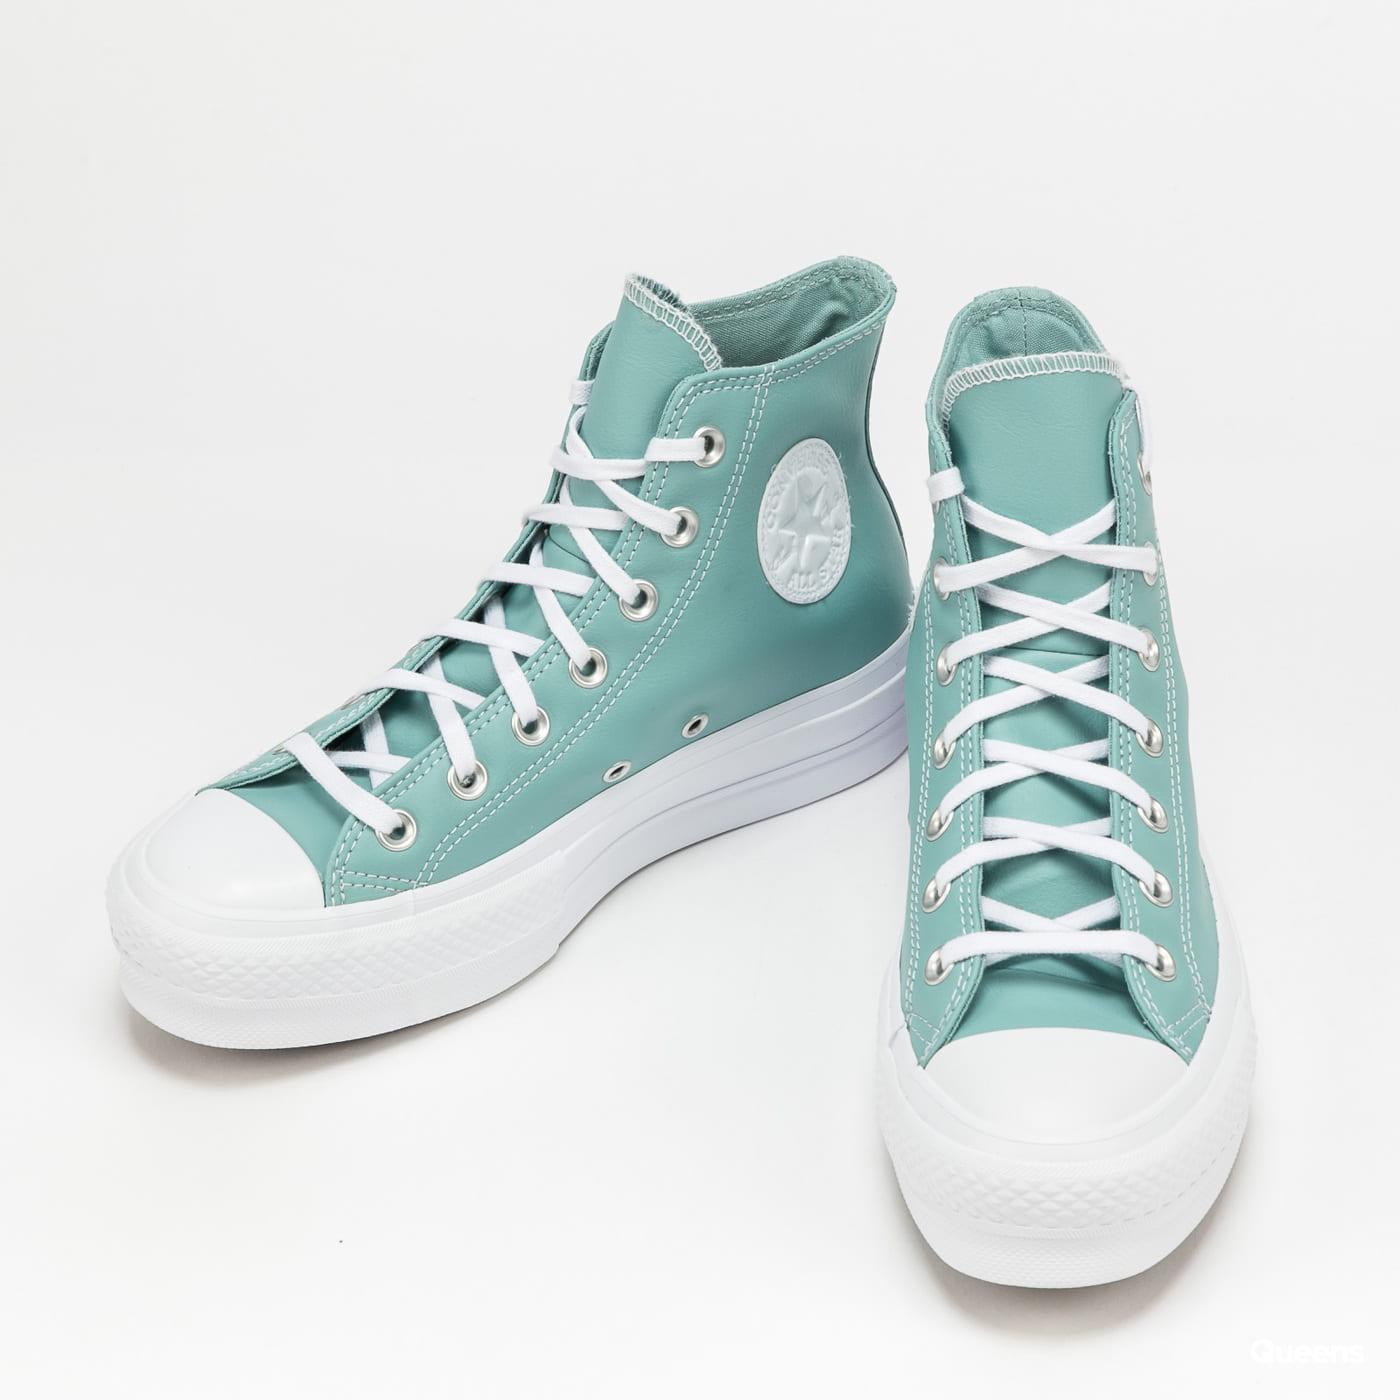 Converse Chuck Taylor All Star Lift Hi soft aloe / white / white